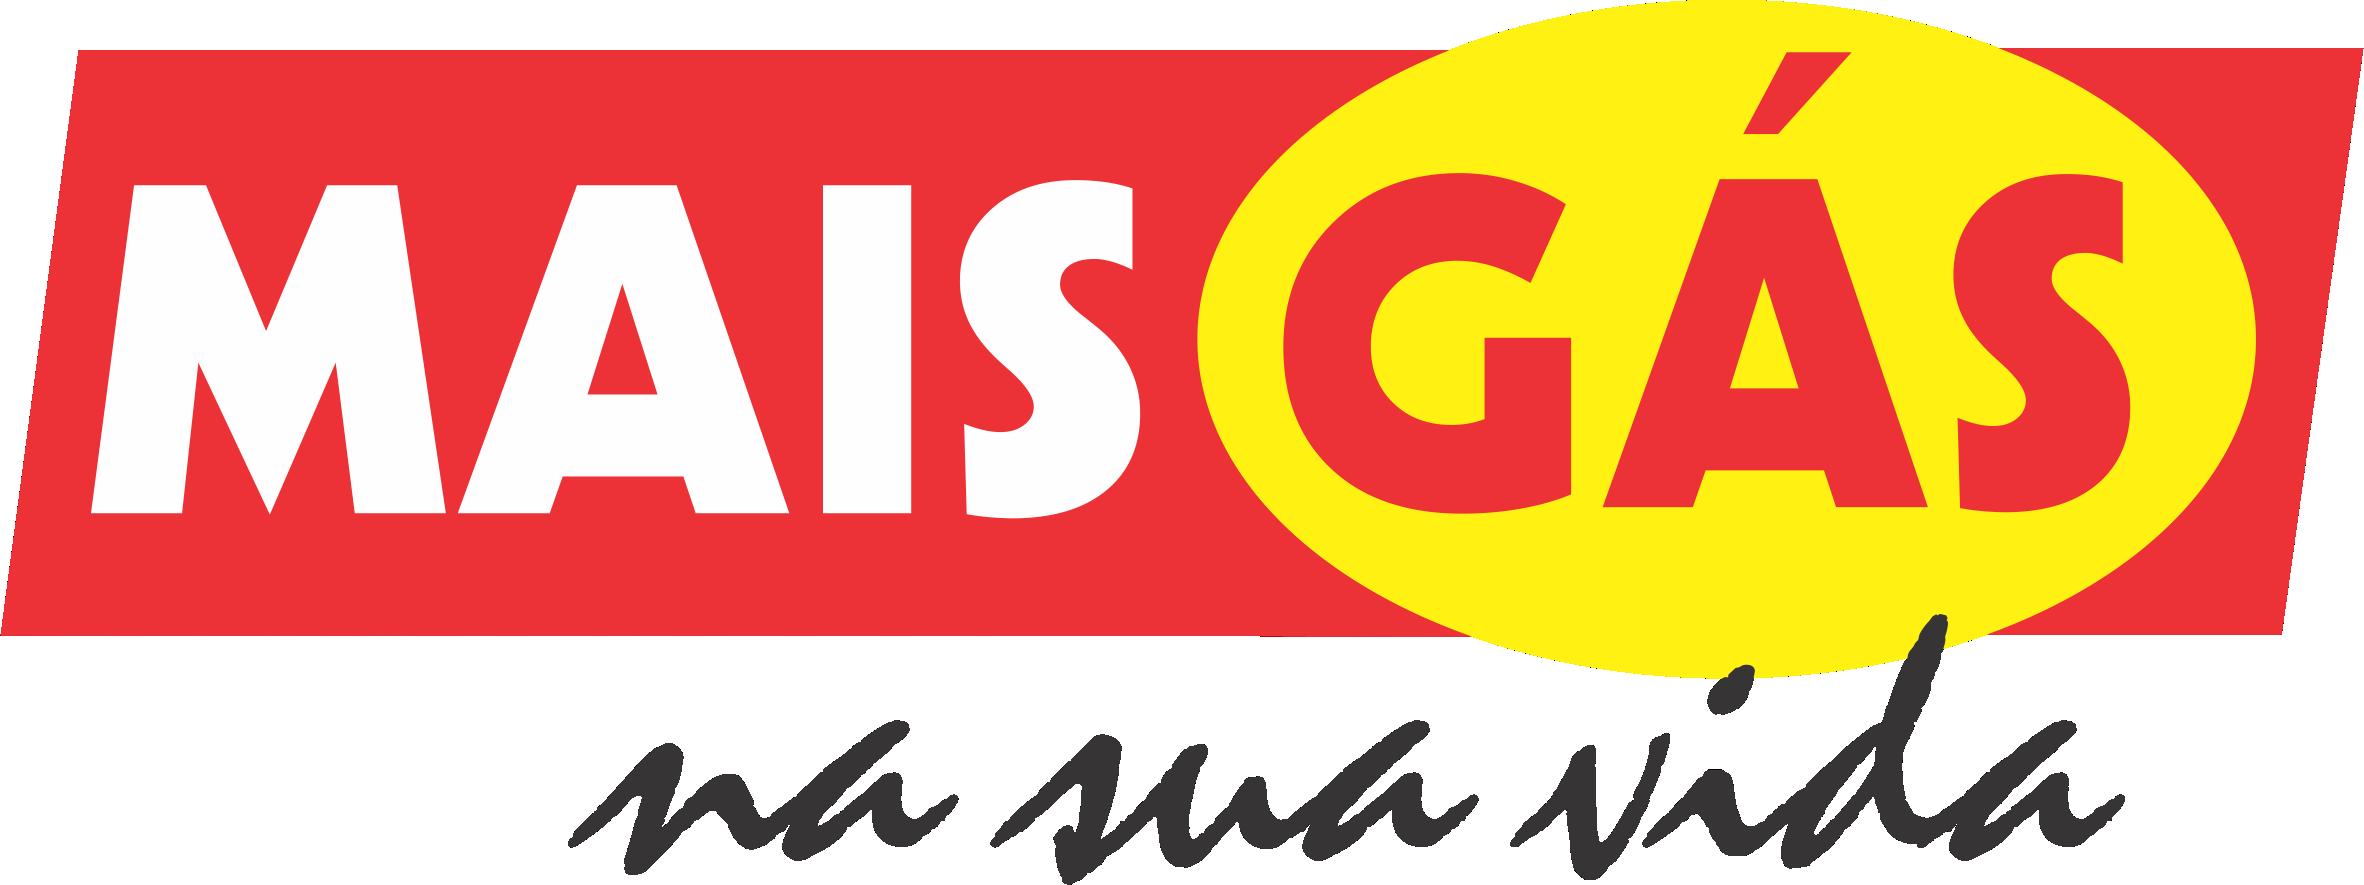 logo_maisgas